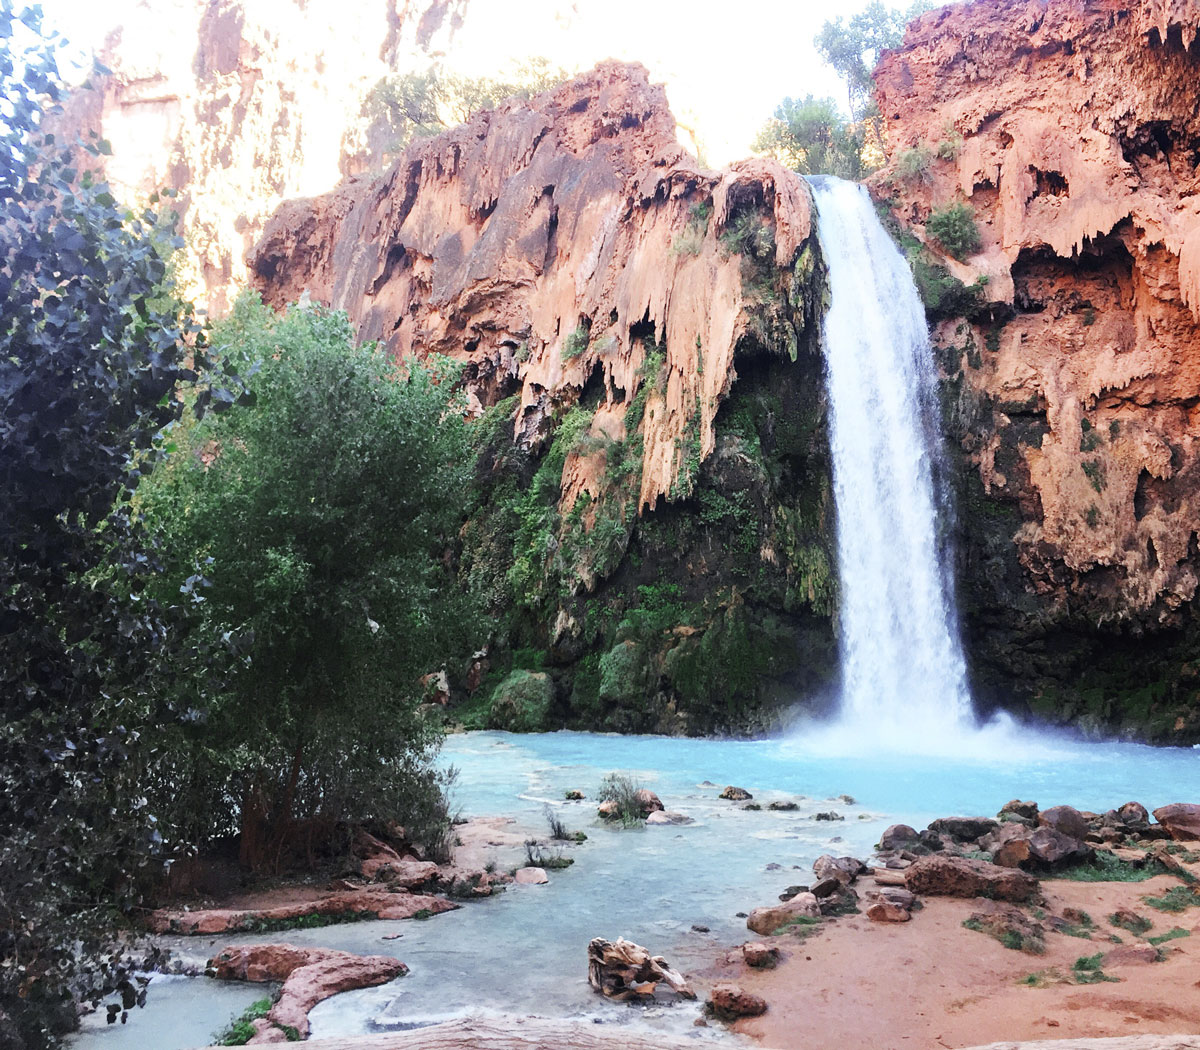 Havasu-Falls-Havasupai-Arizona-Grand-Canyon-Hiking-Guide-By-Bumble-and-Bustle-3